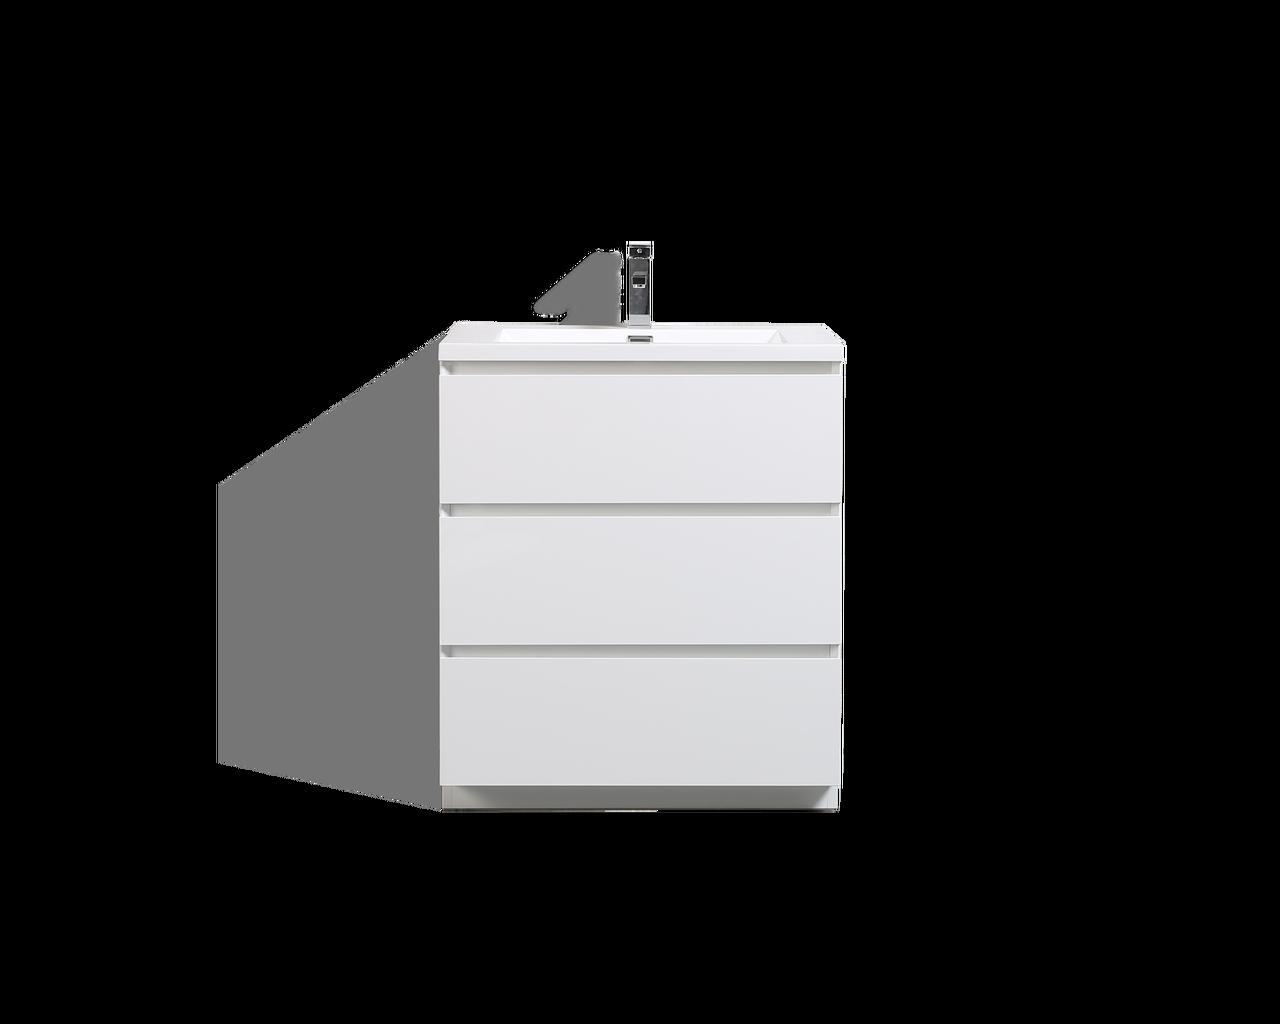 Moa 30 Gloss White Modern Bathroom Vanity W 3 Drawers And Acrylic Sink Bathroom Vanities Wholesale Inc